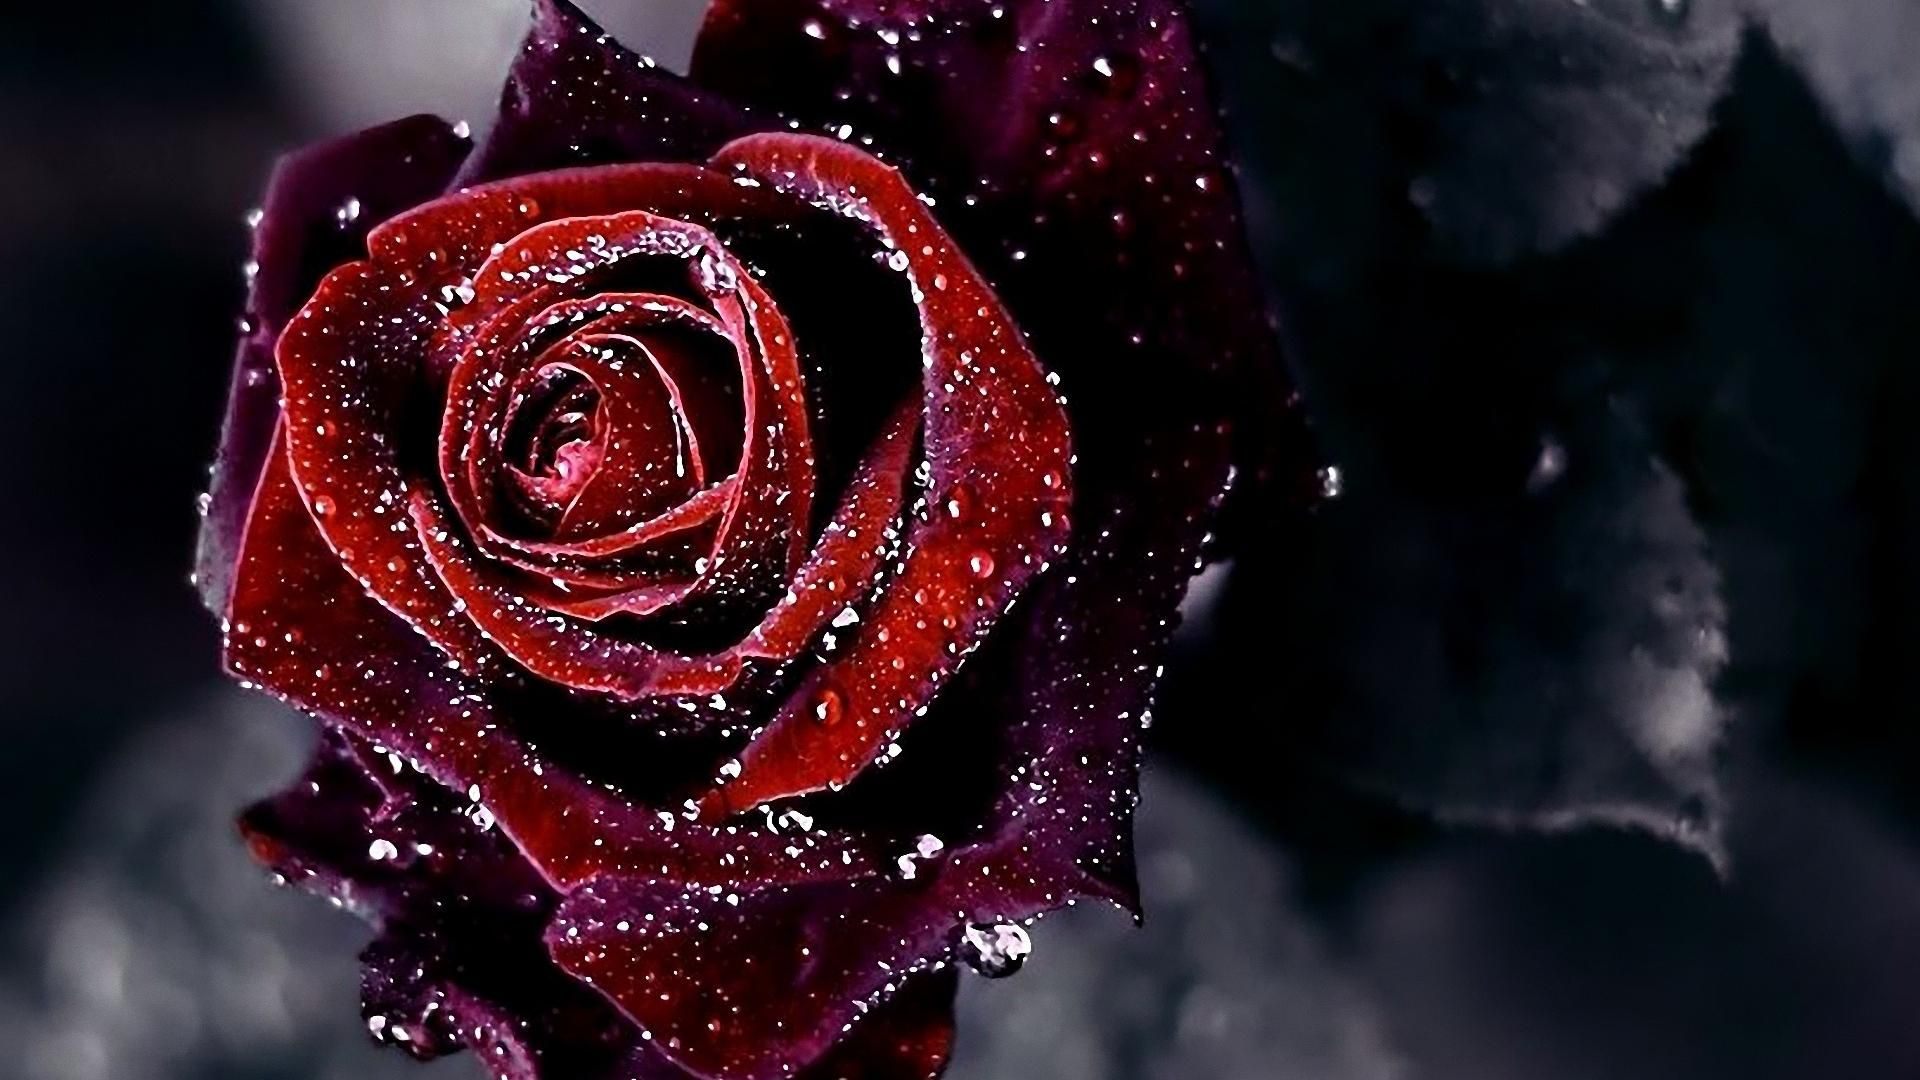 Red Flowers Wallpaper Hd 1 Red Flower Wallpaper Rose Flower Wallpaper Red Rose Flower